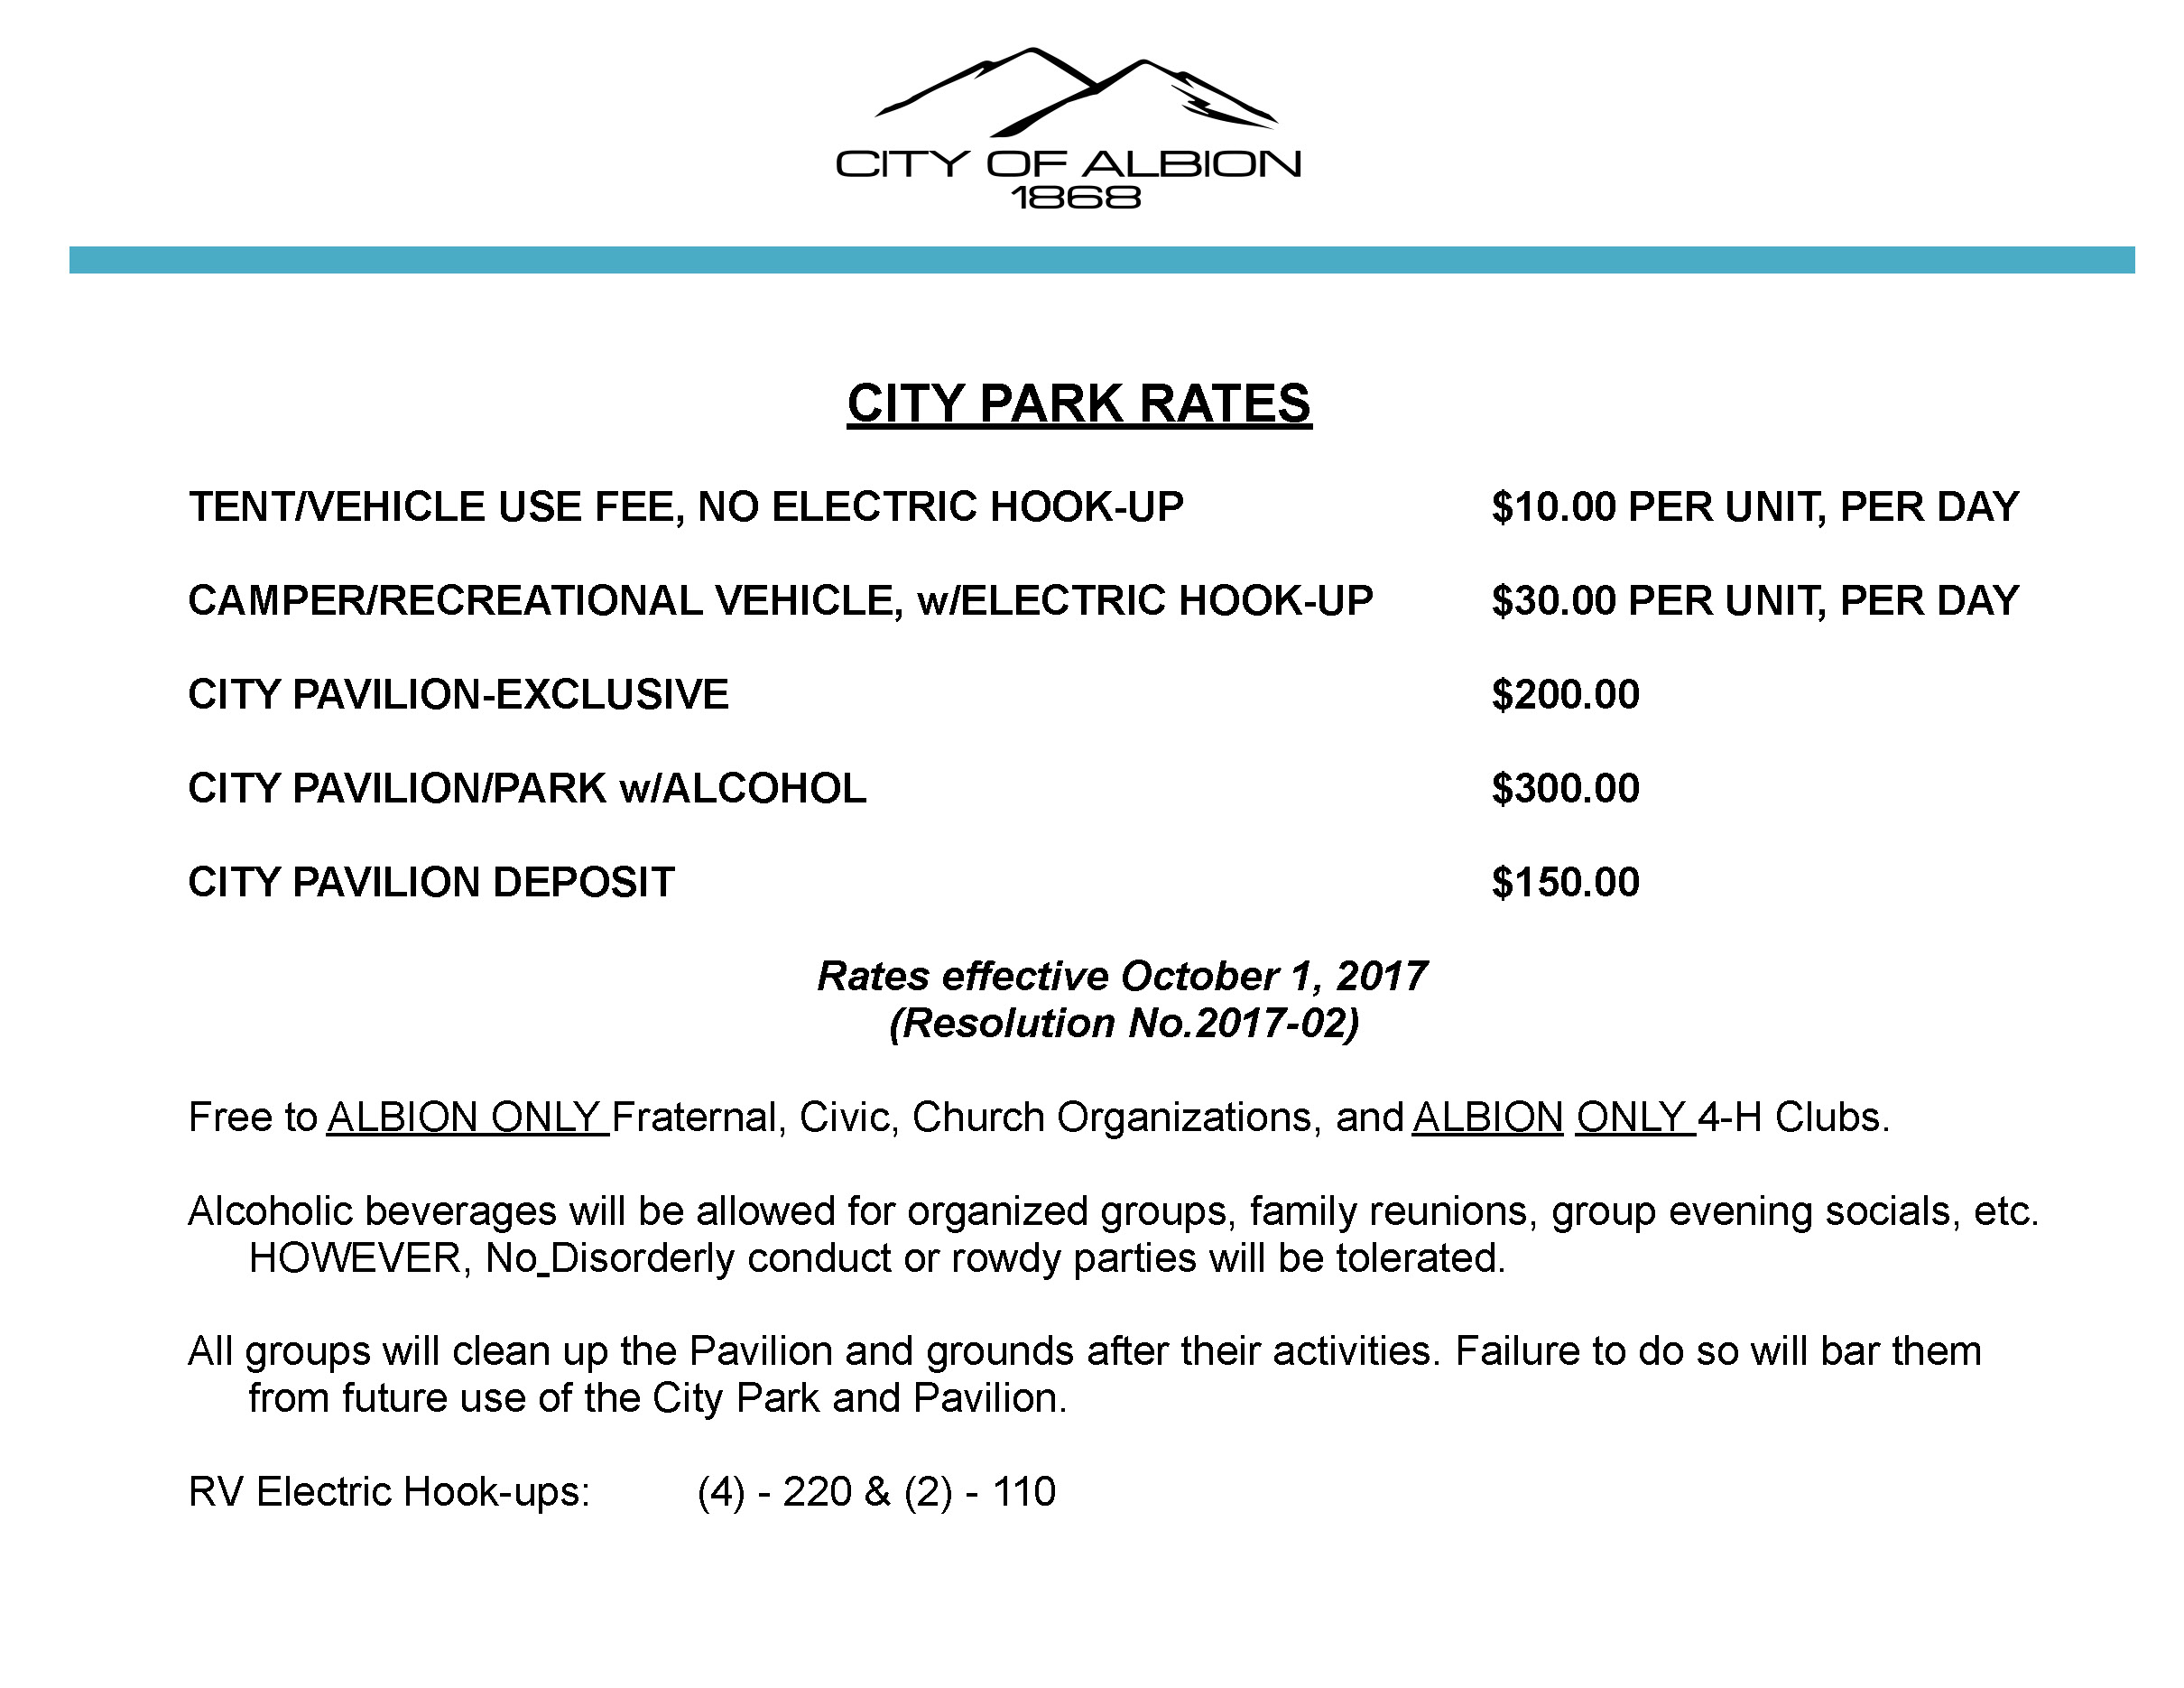 City Calendar-Park Rates 2019.jpg